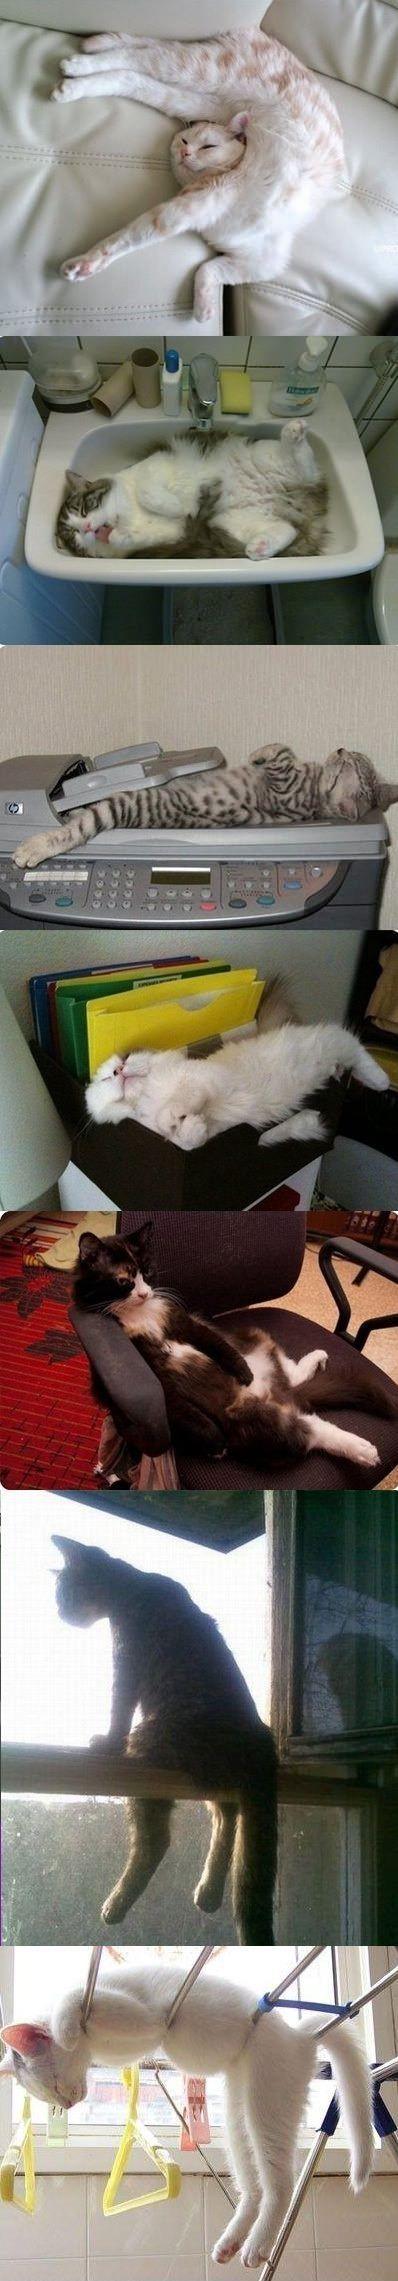 Cats...